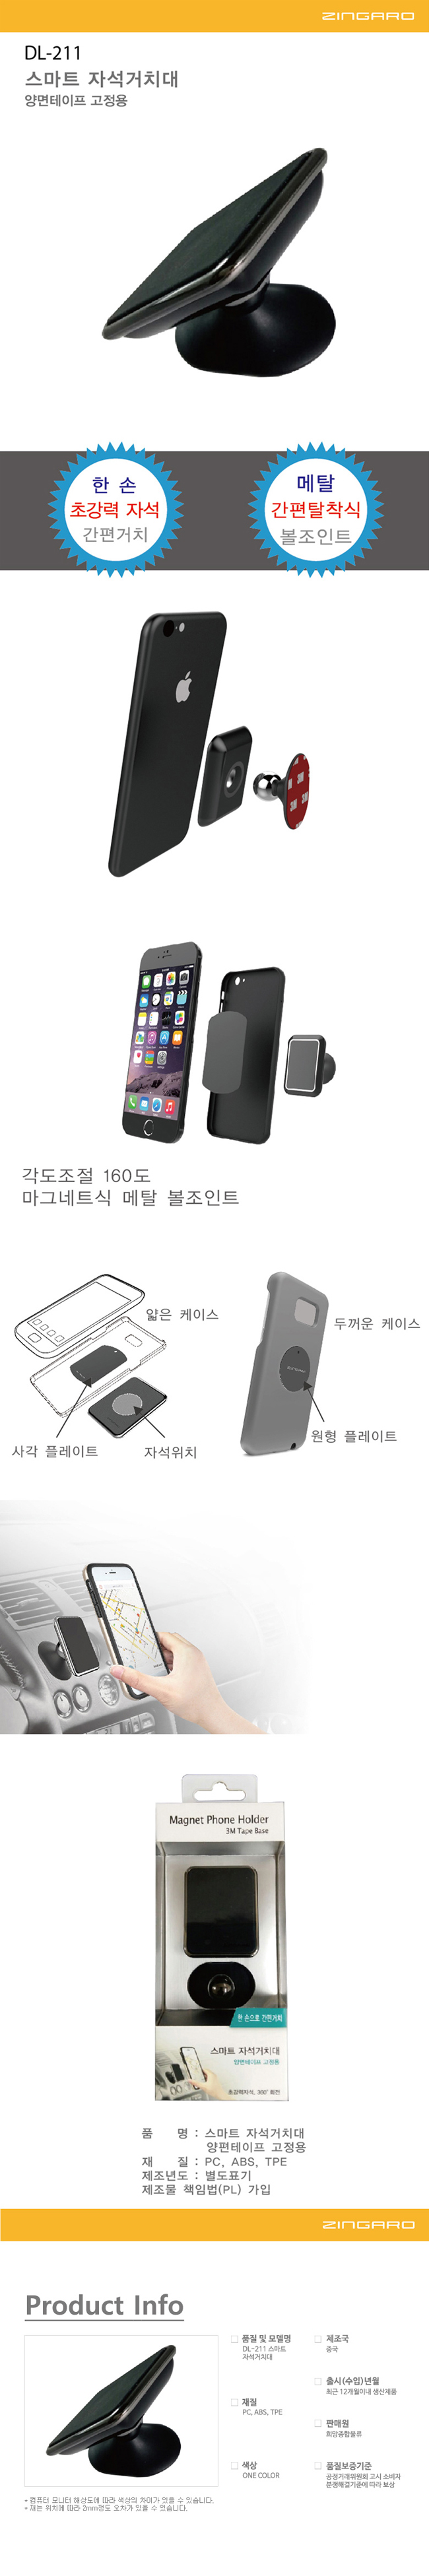 [Ritz] 릿츠 zingaro 스마트폰 자석거치대(DL-211)